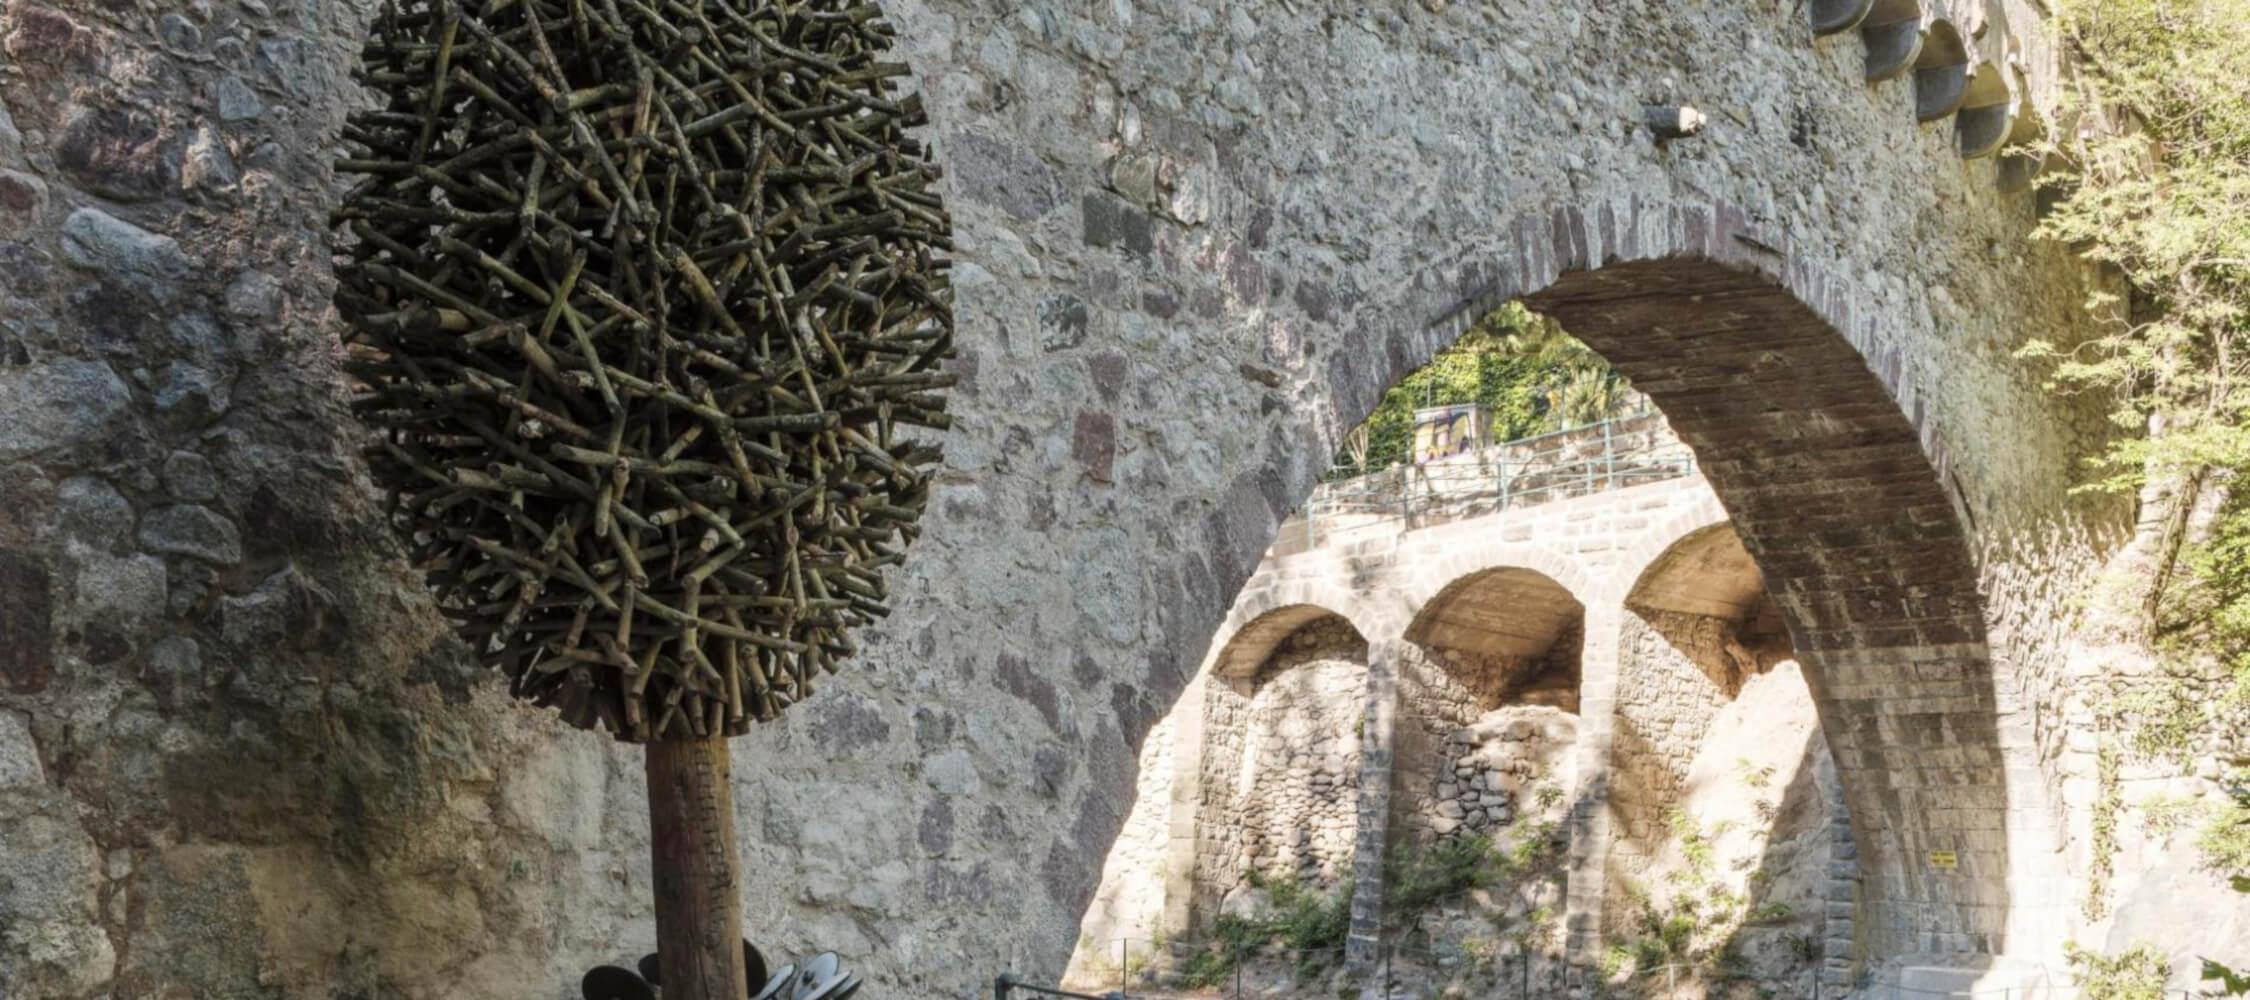 Italien-Trentino_Suedtirol_Alto_Adige_Merano_Meran_Natur_Gilfpromenade_art_Nature_Steinerner_Steg_DavidePerbellini_2250x1000